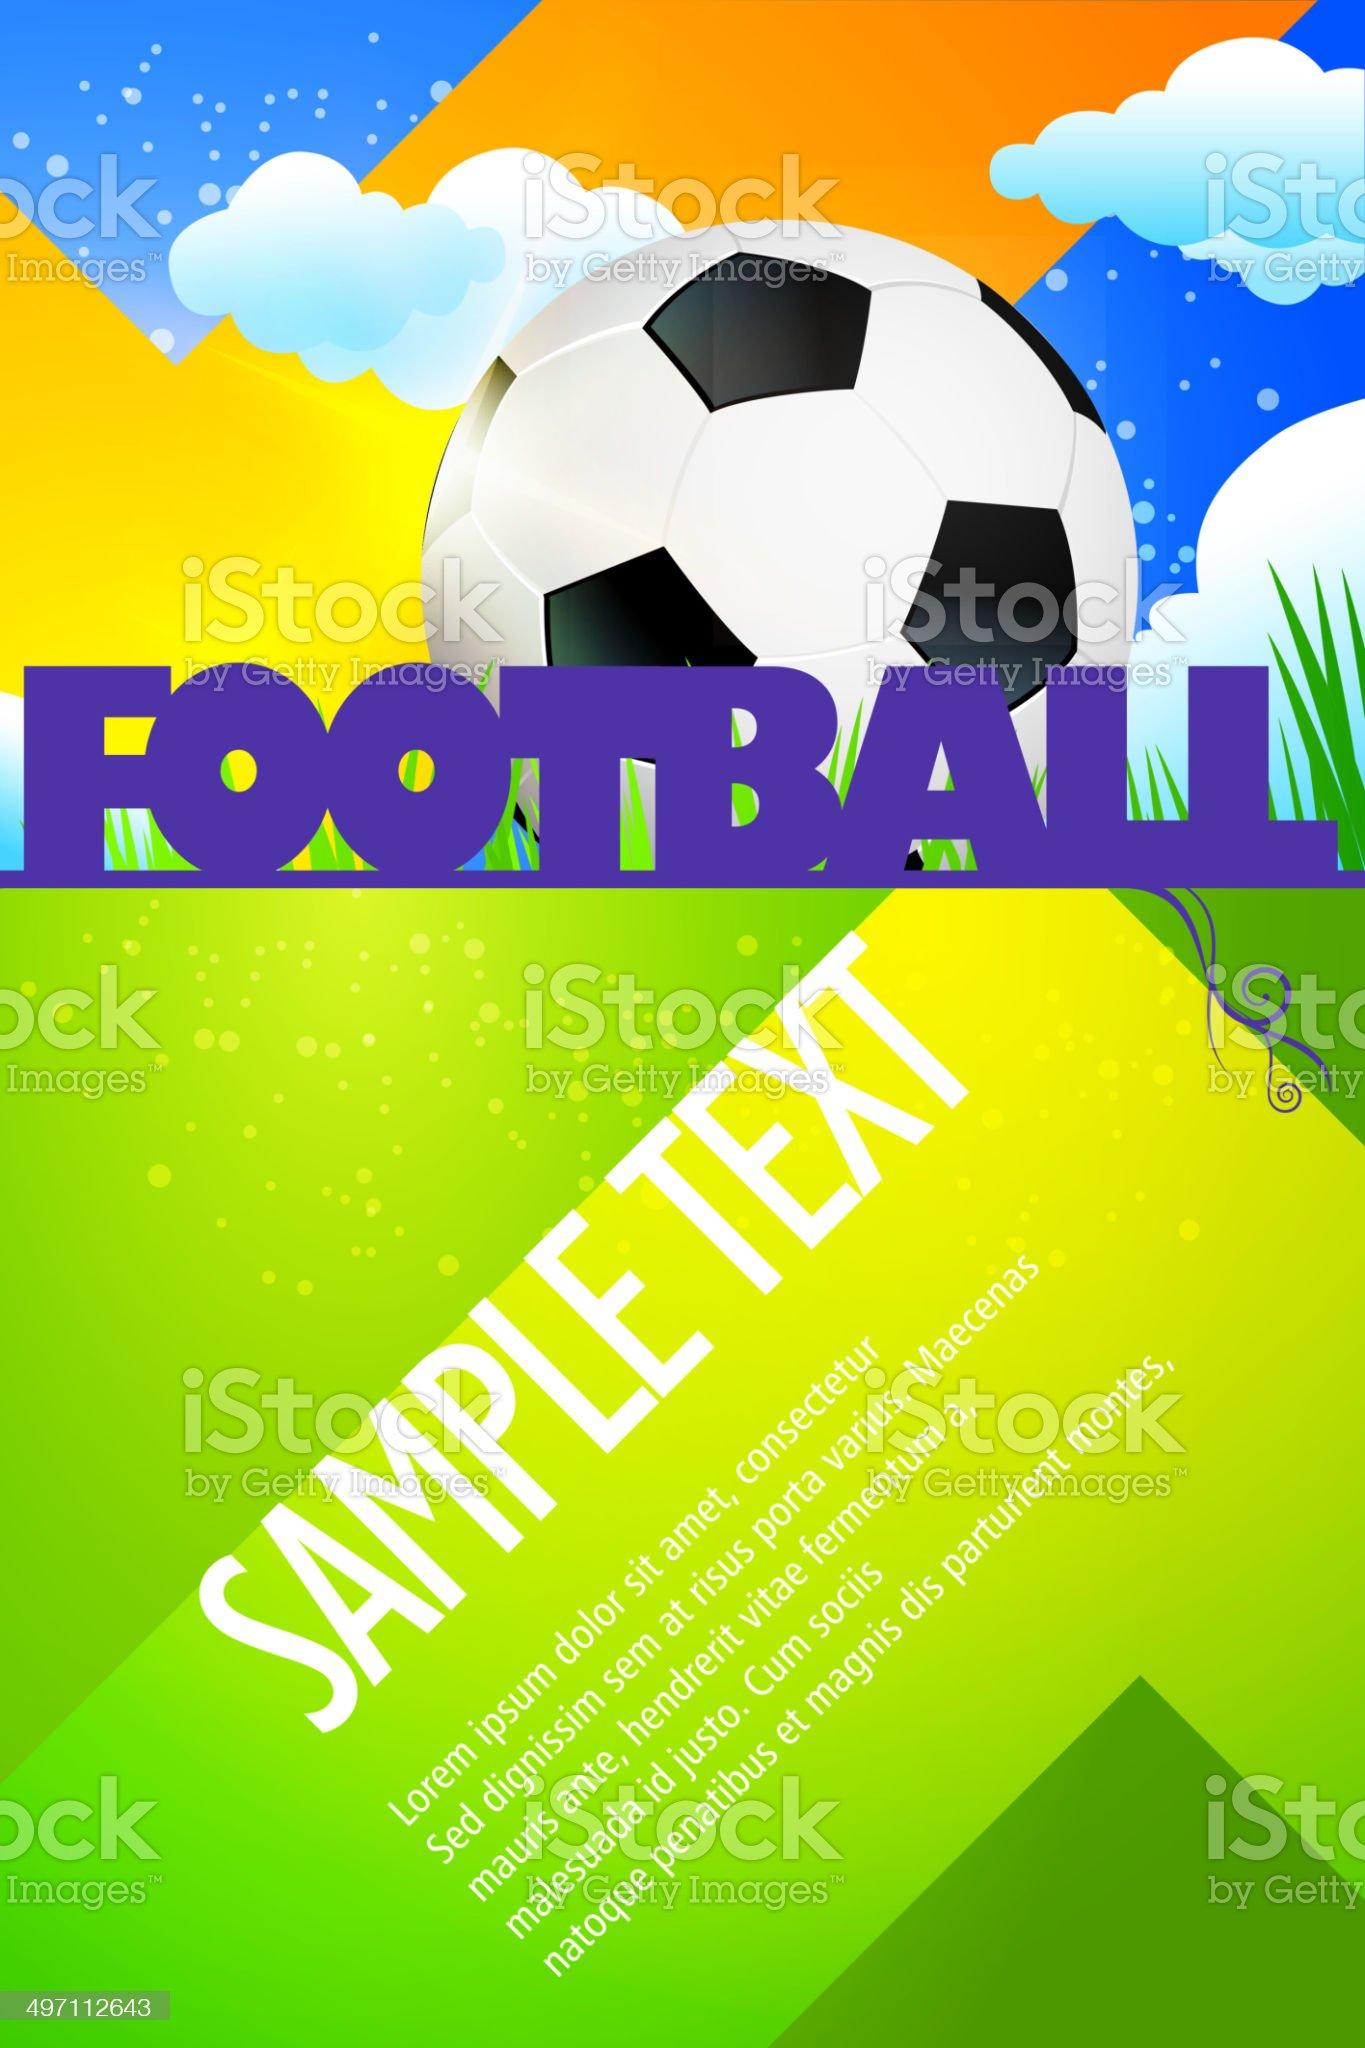 Sports Background - Football royalty-free stock vector art